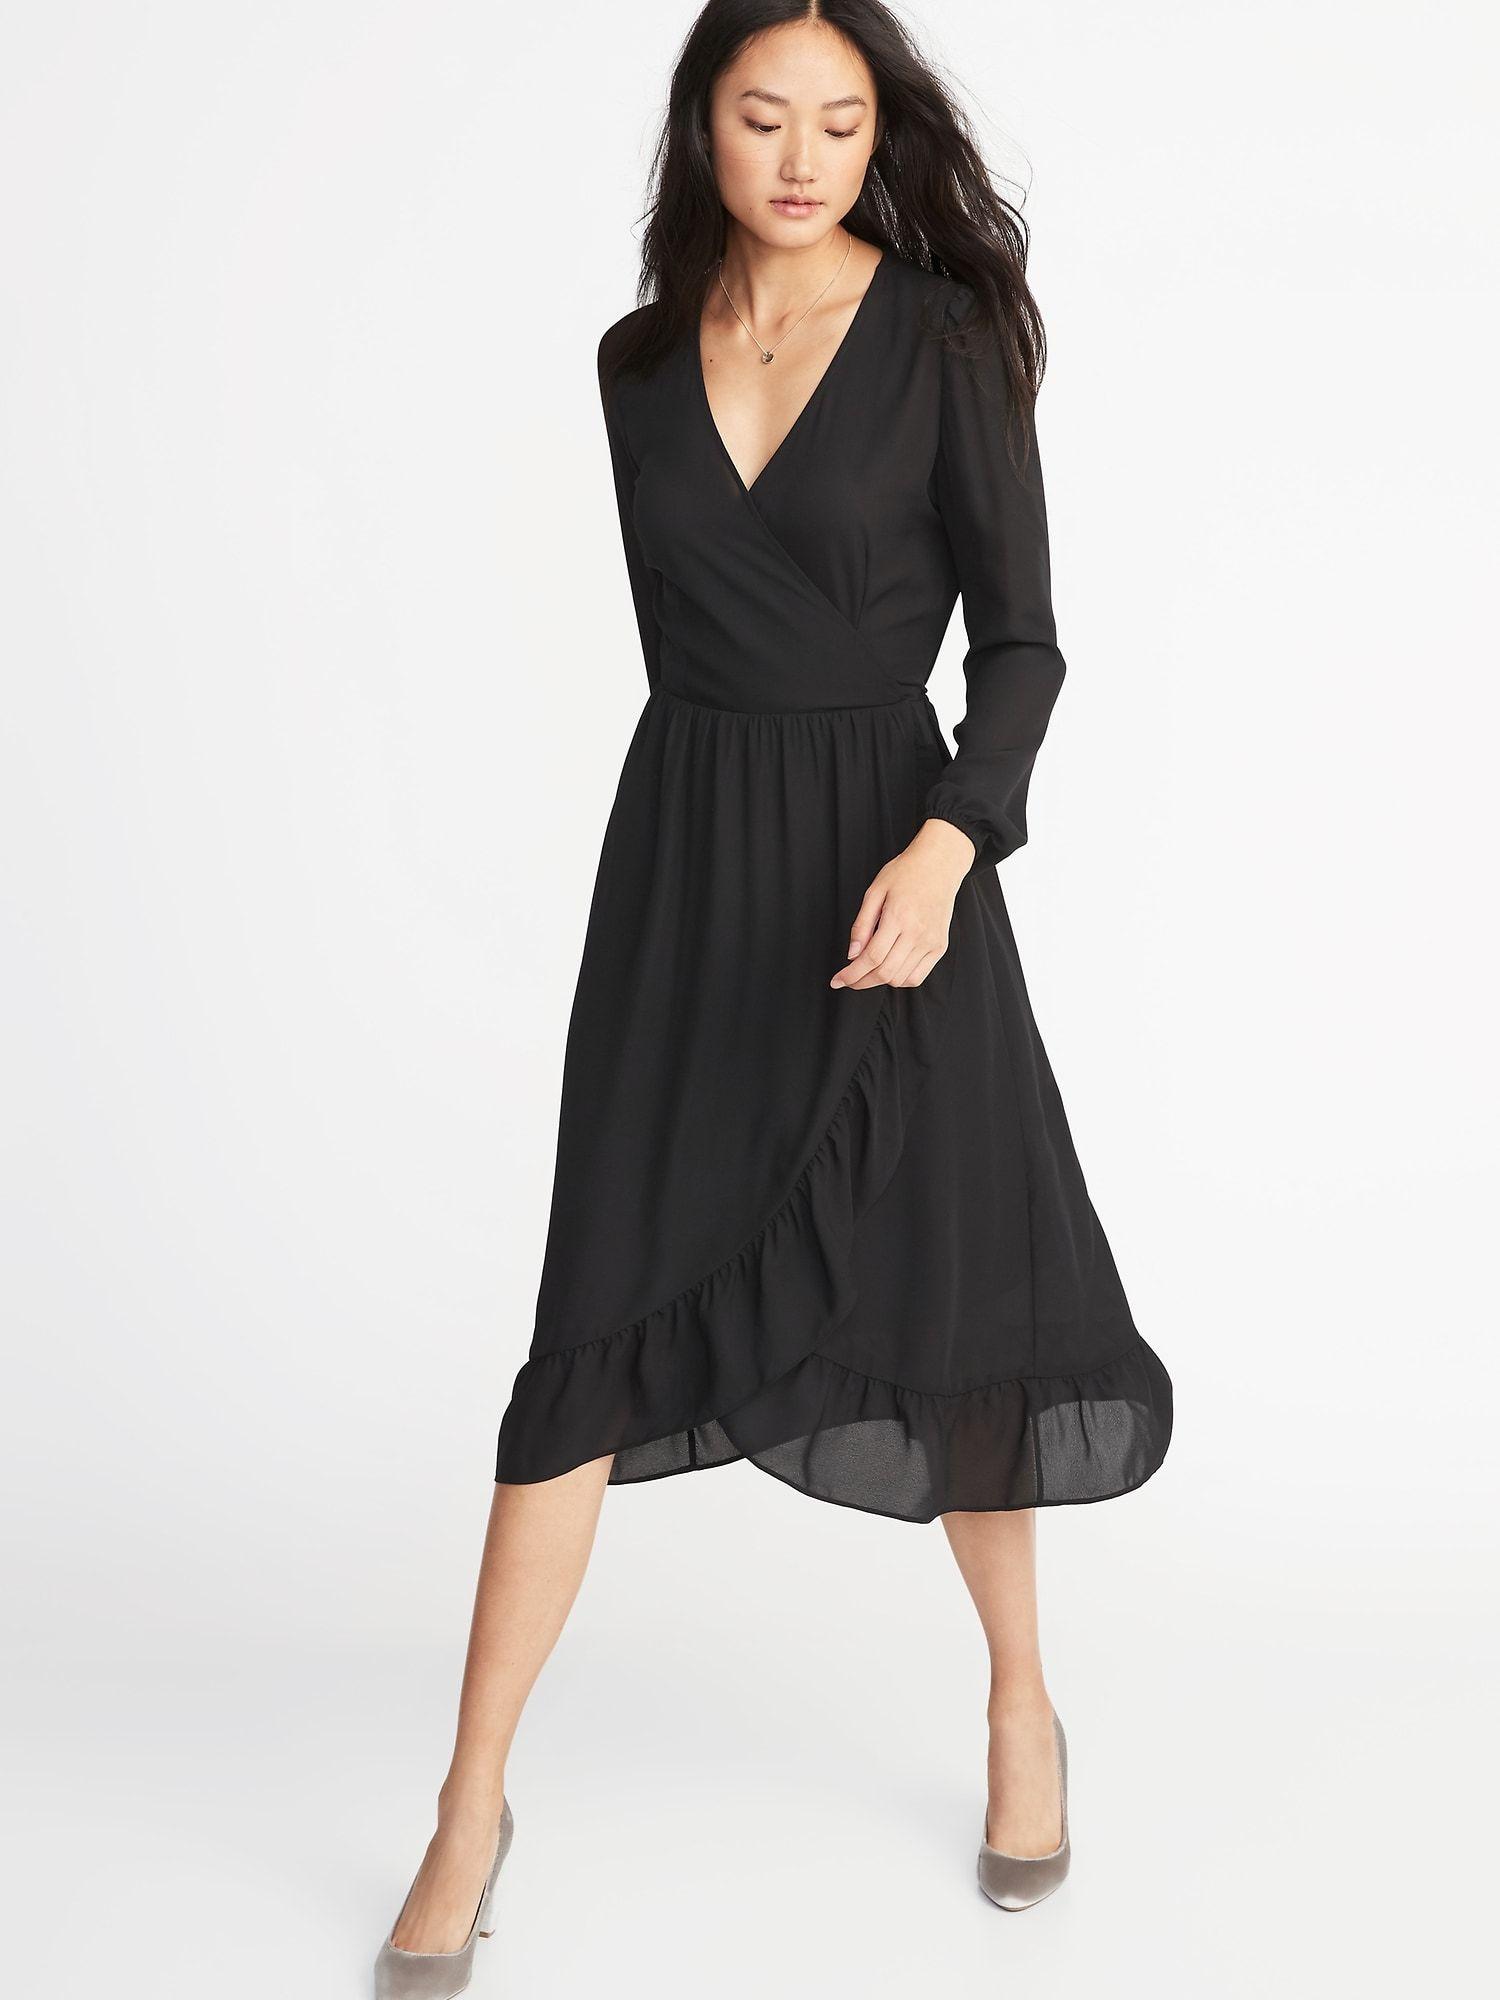 Product Photo Dresses Georgette Dress Wrap Dress Outfit [ 2000 x 1500 Pixel ]